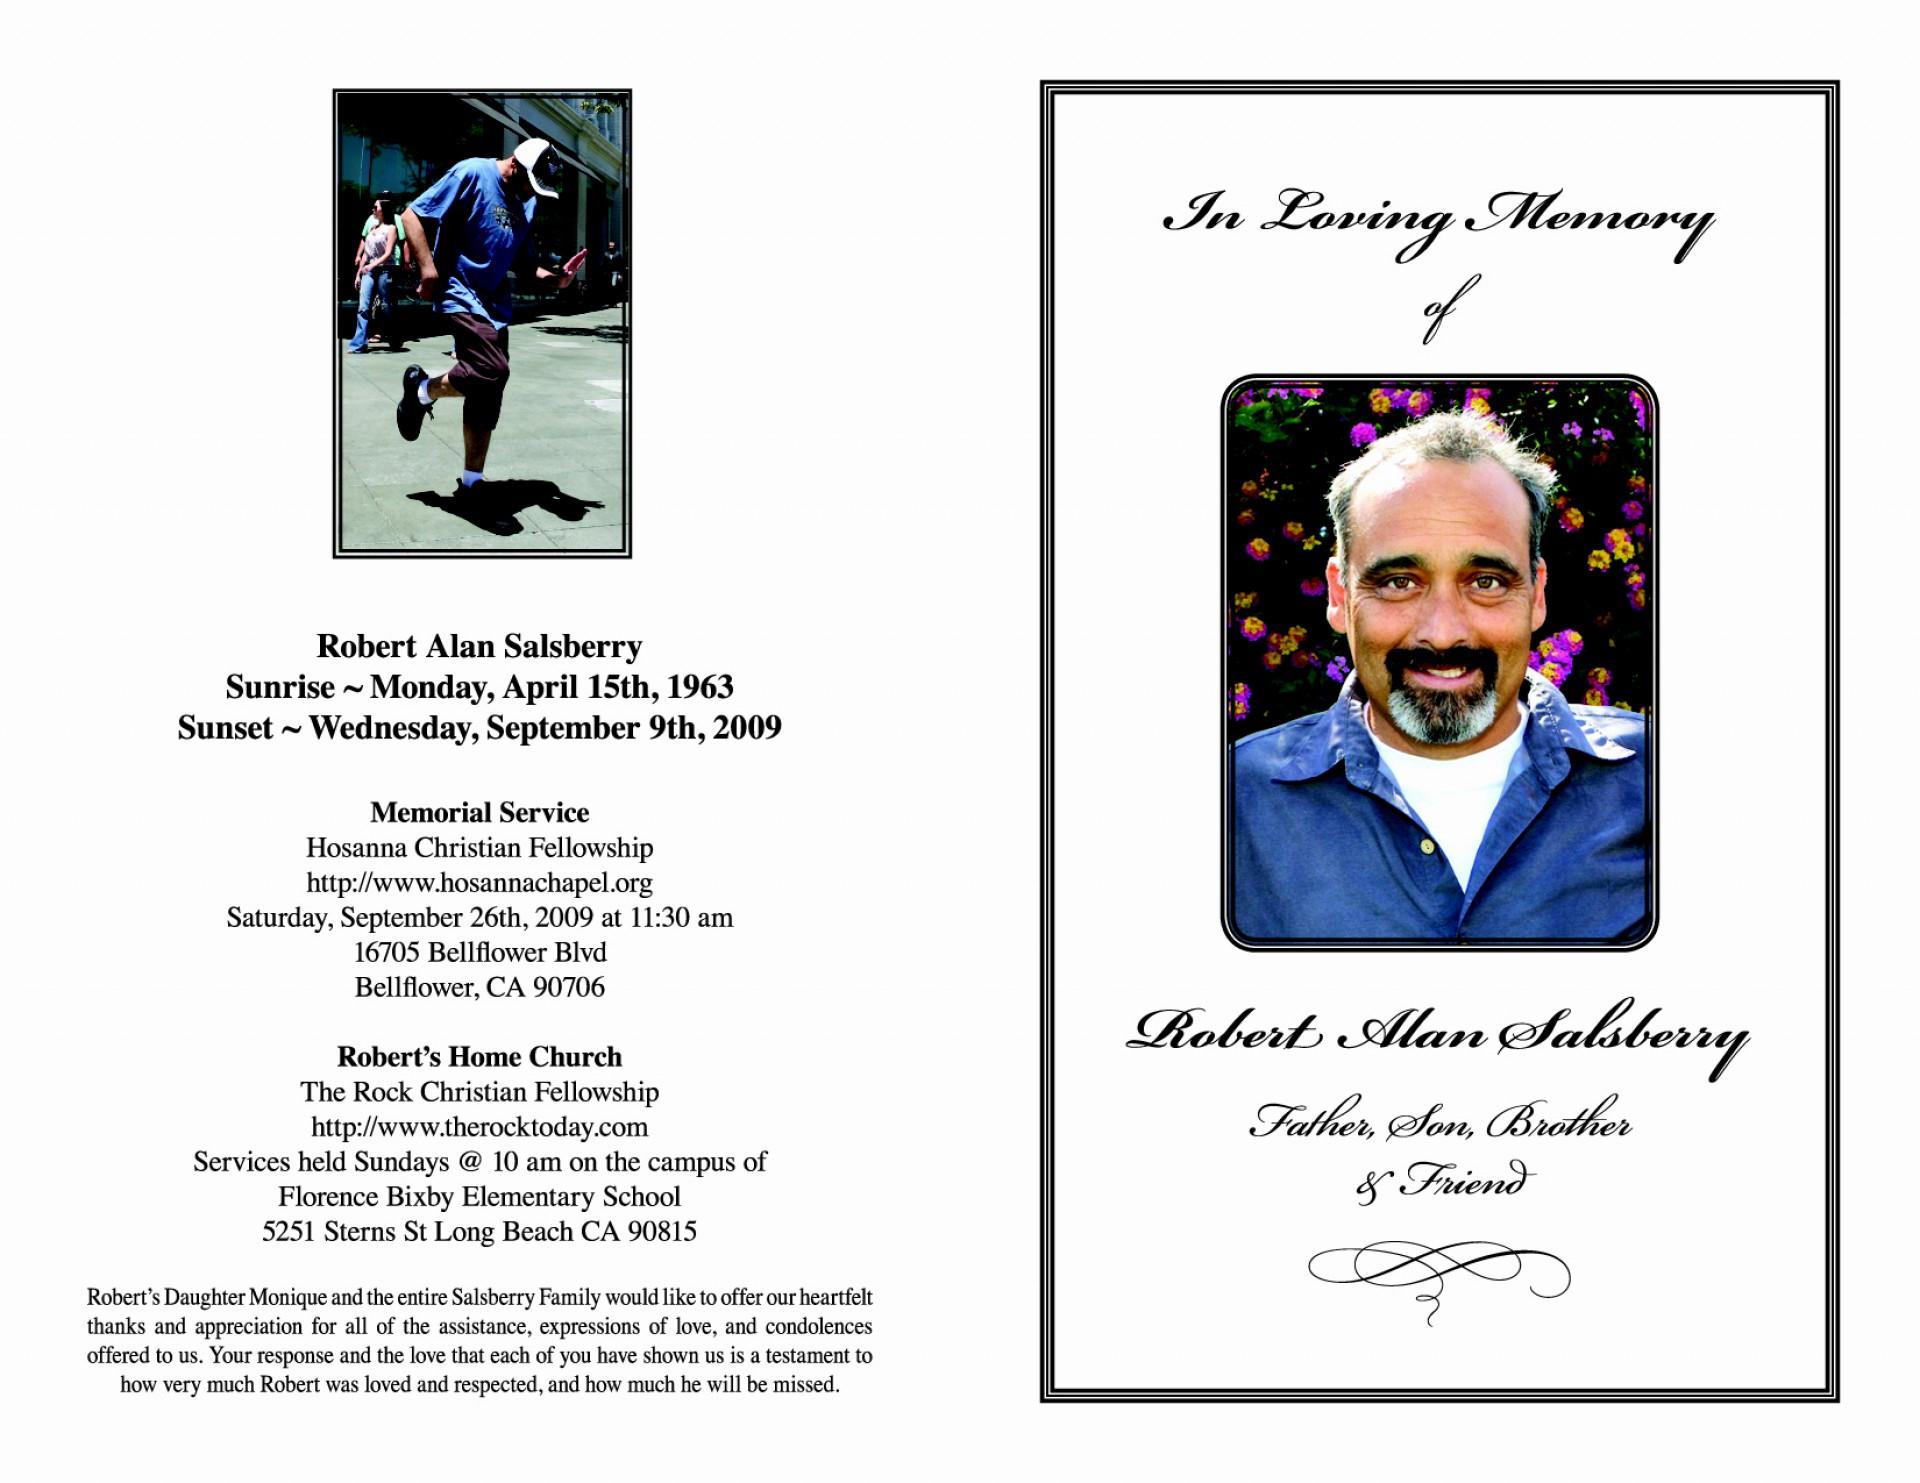 018 Memorial Card Template Free Download Simple Funeral Prayer Cards - Free Printable Funeral Prayer Card Template